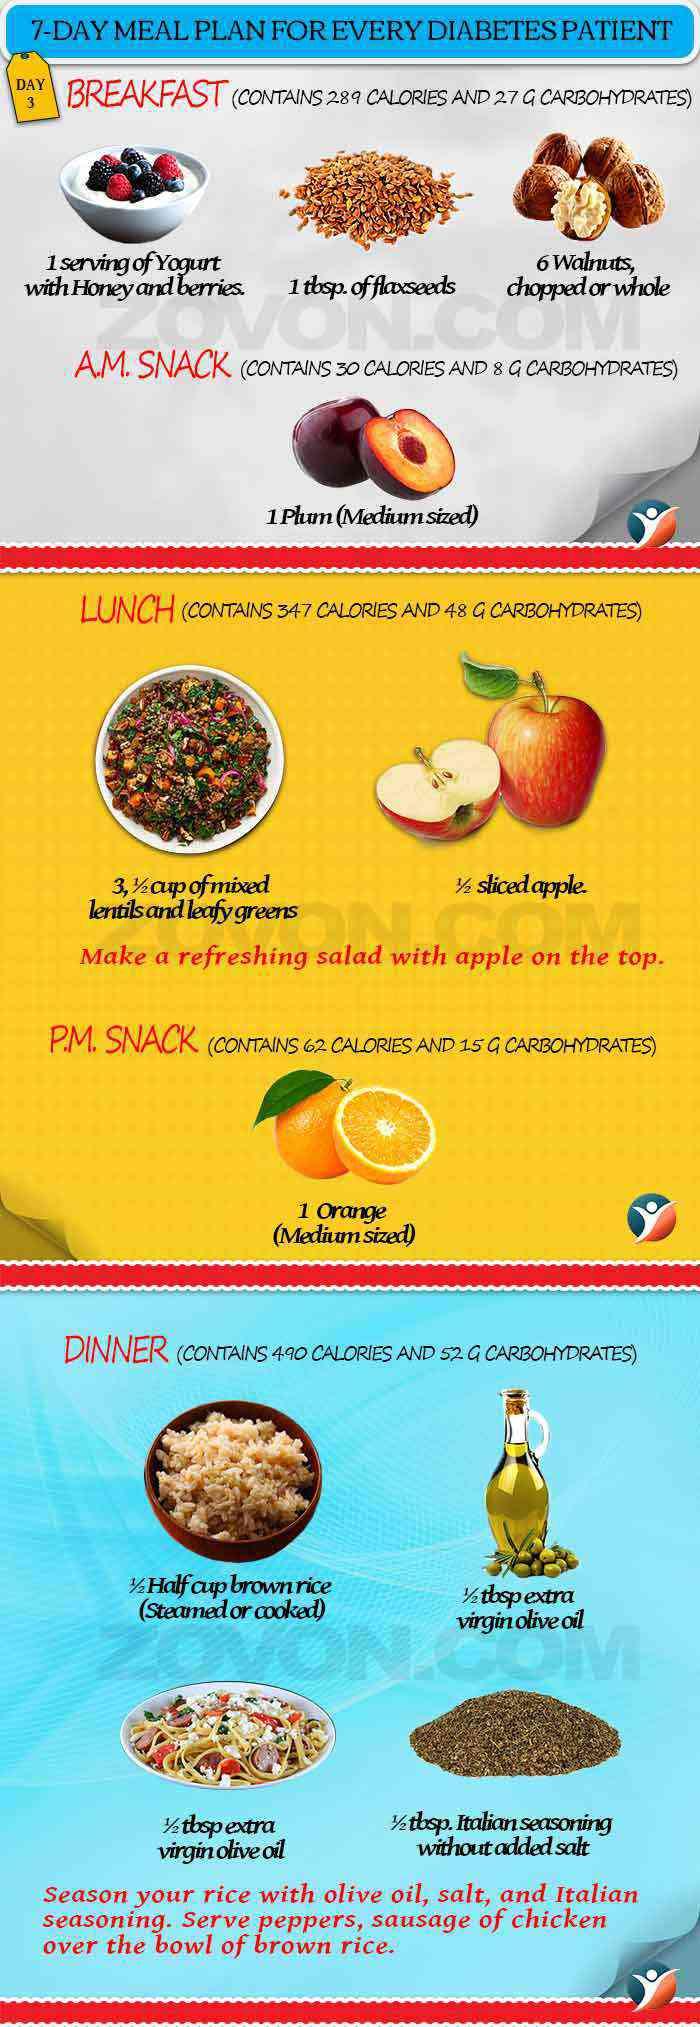 diabetes diet plan day 3